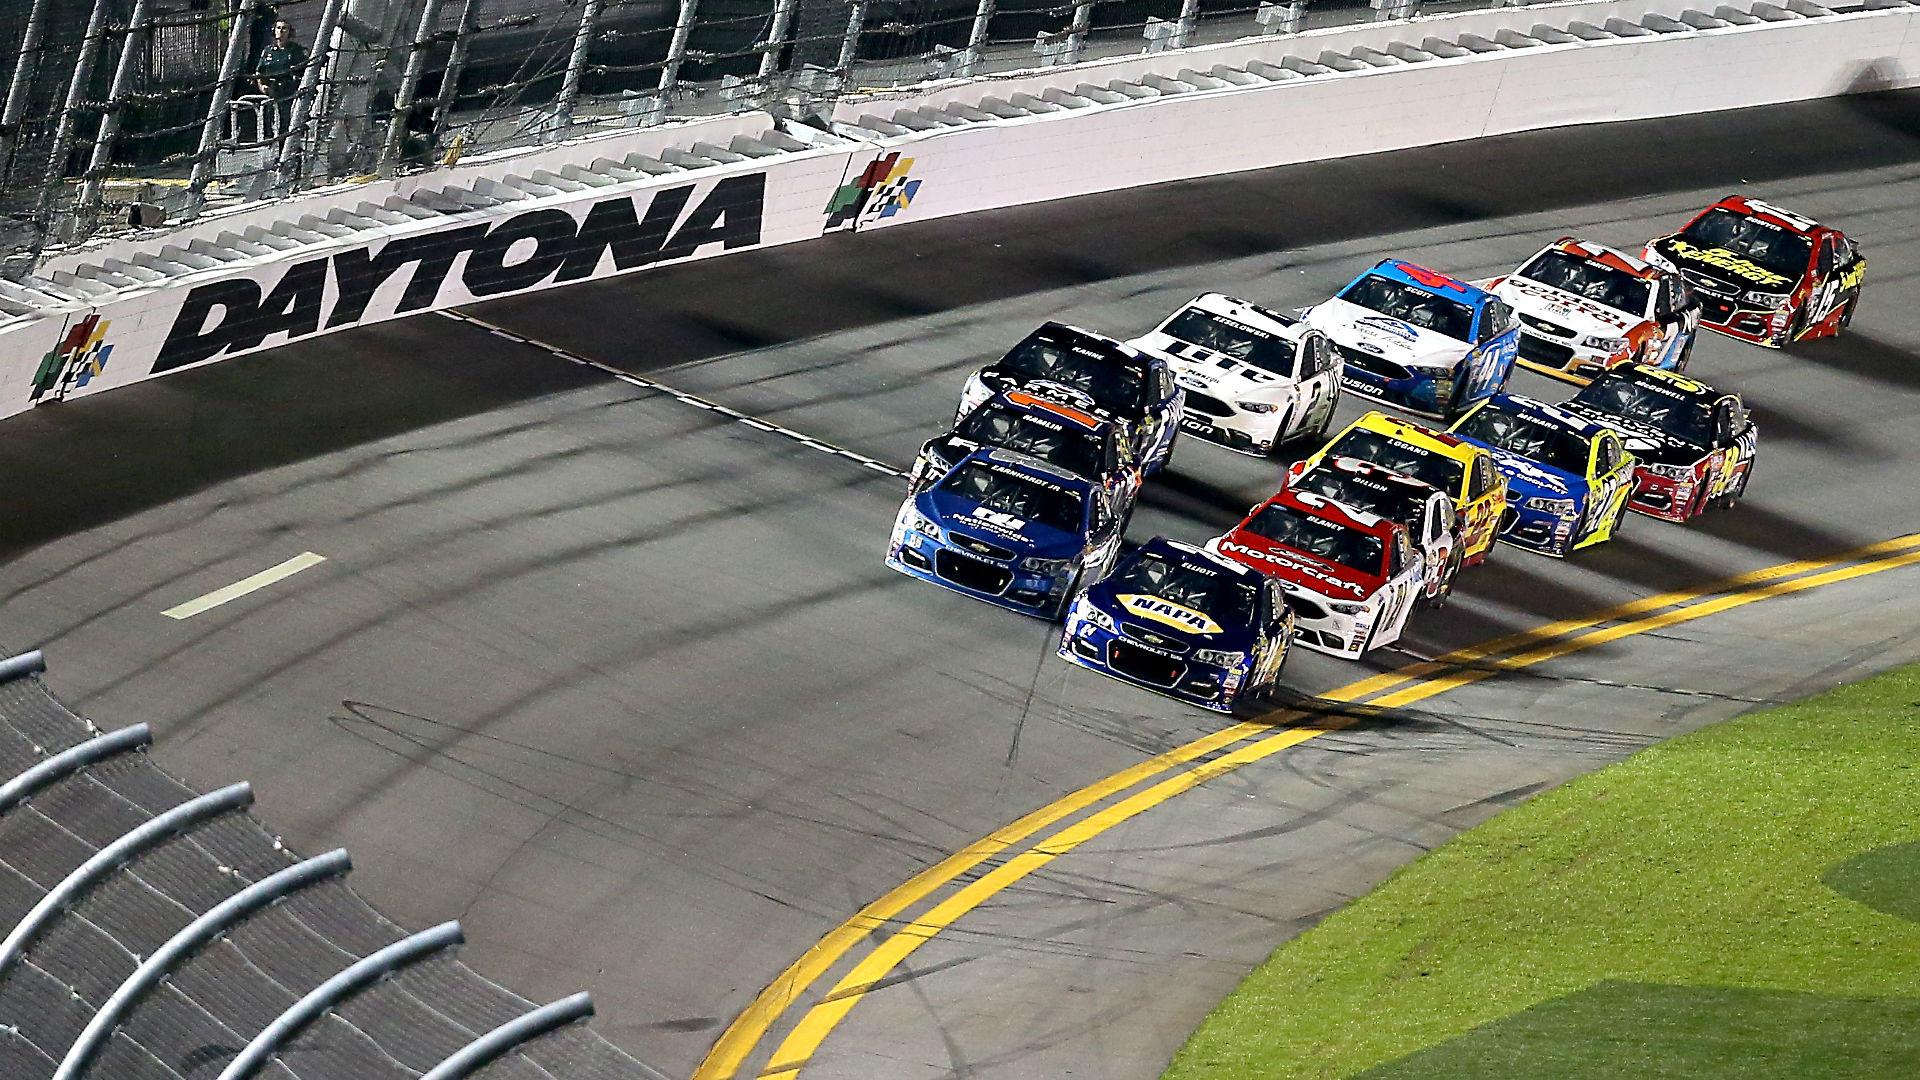 Daytona international Speedway Richard Petty driving experience